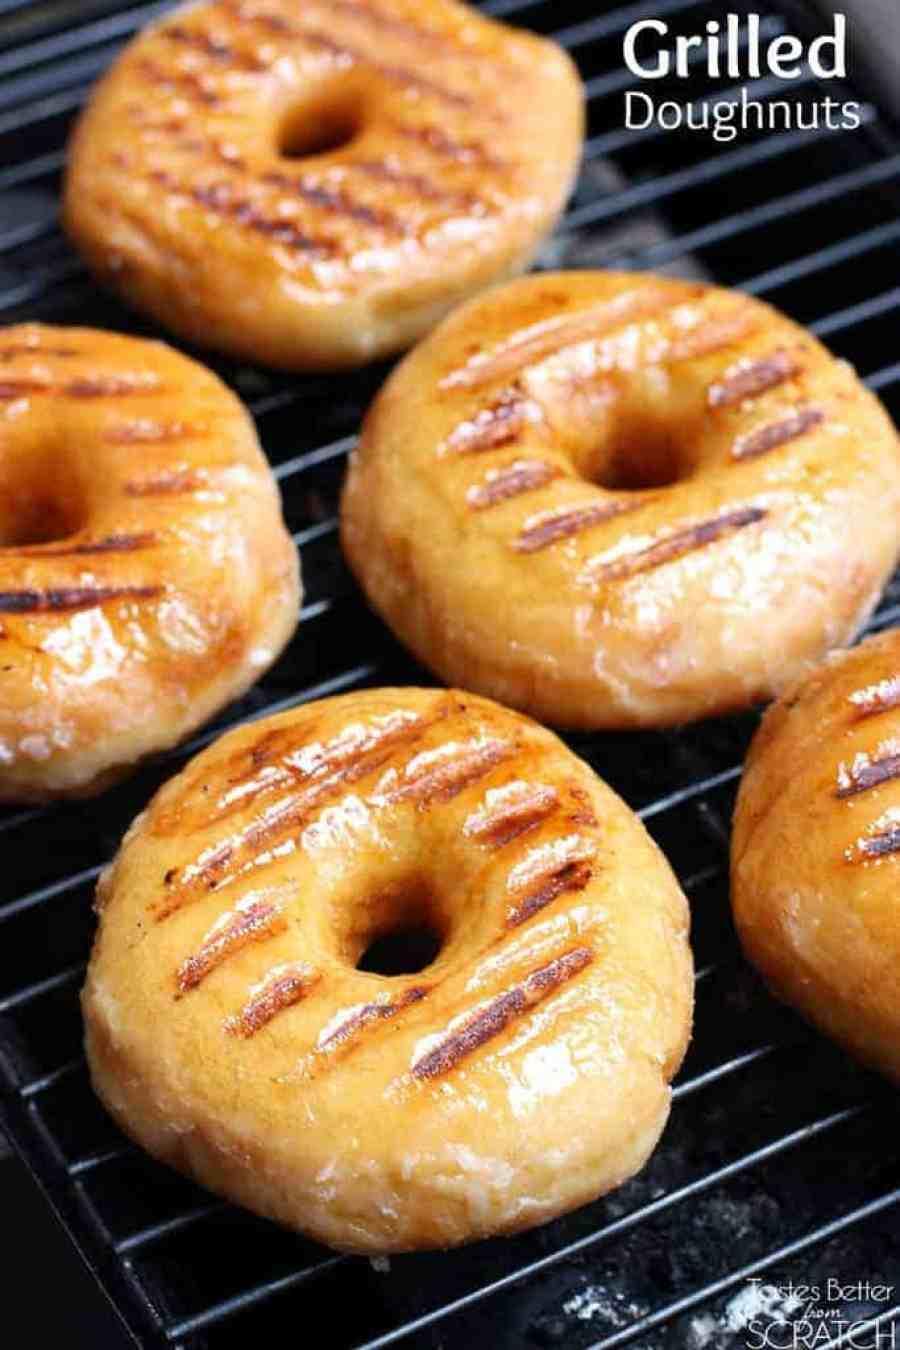 Grilled Doughnuts on TastesBetterFromScratch.com